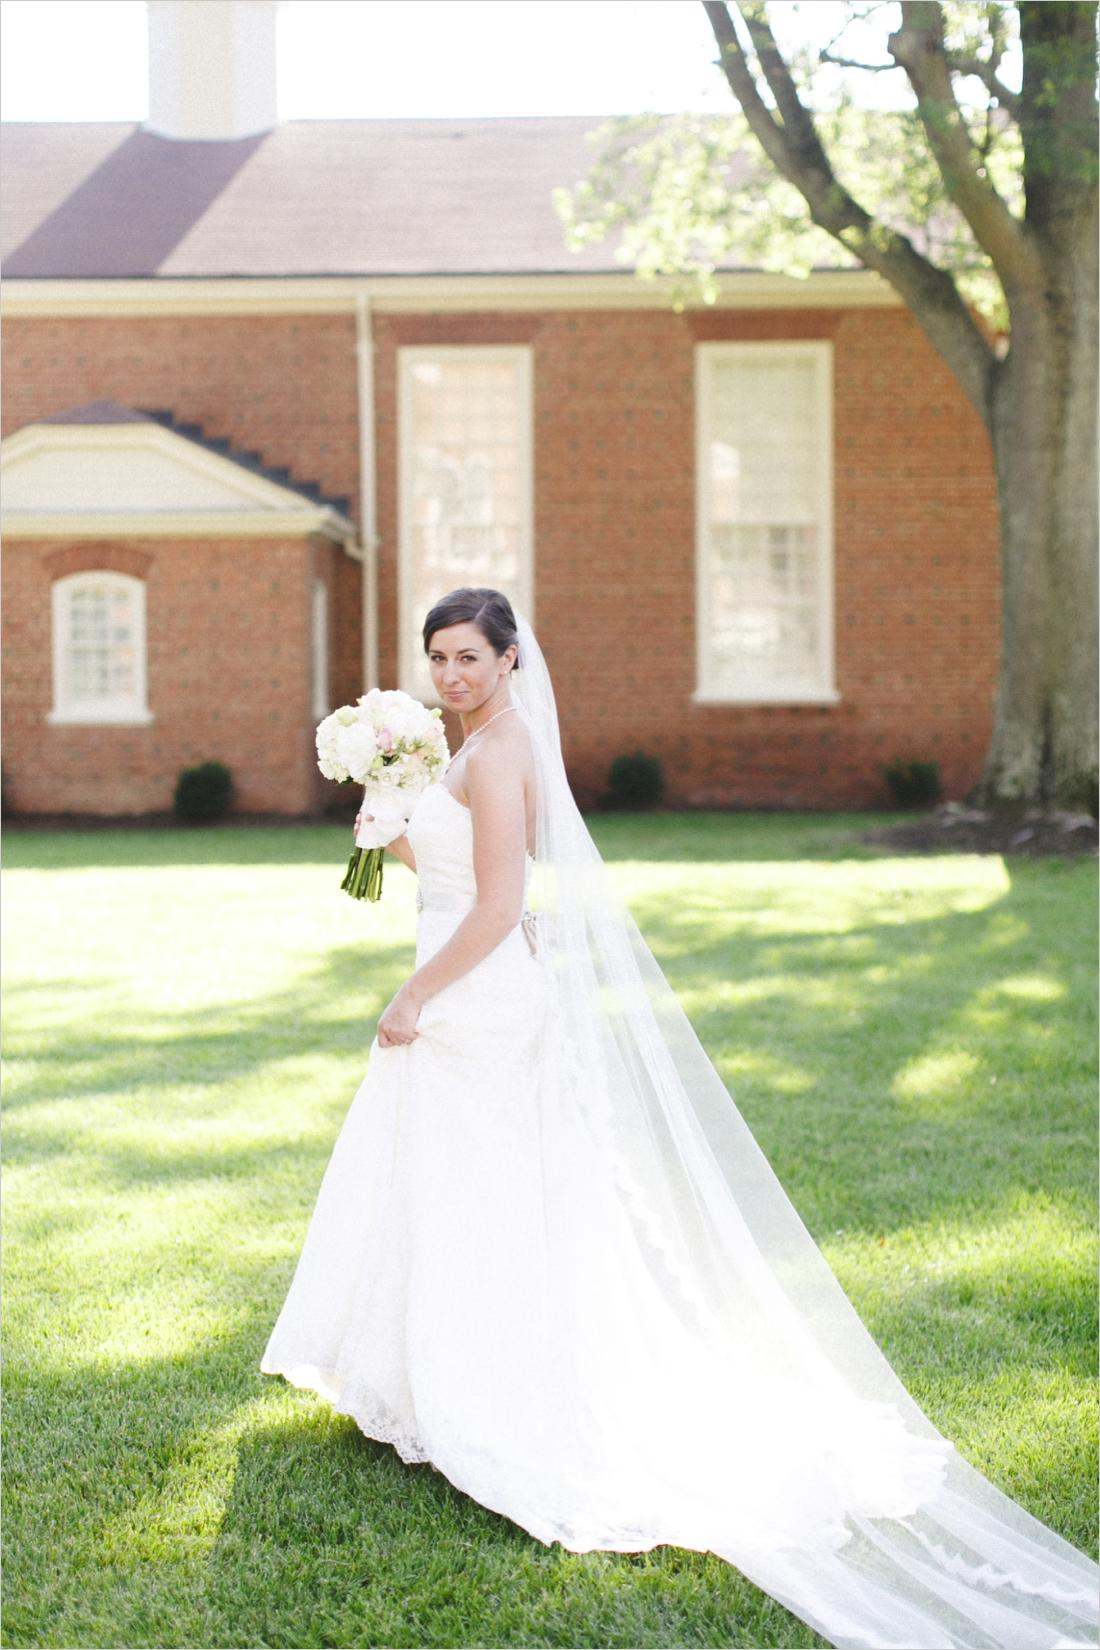 sarah-will-jefferson-hotel-virginia-wedding-photographer_0029